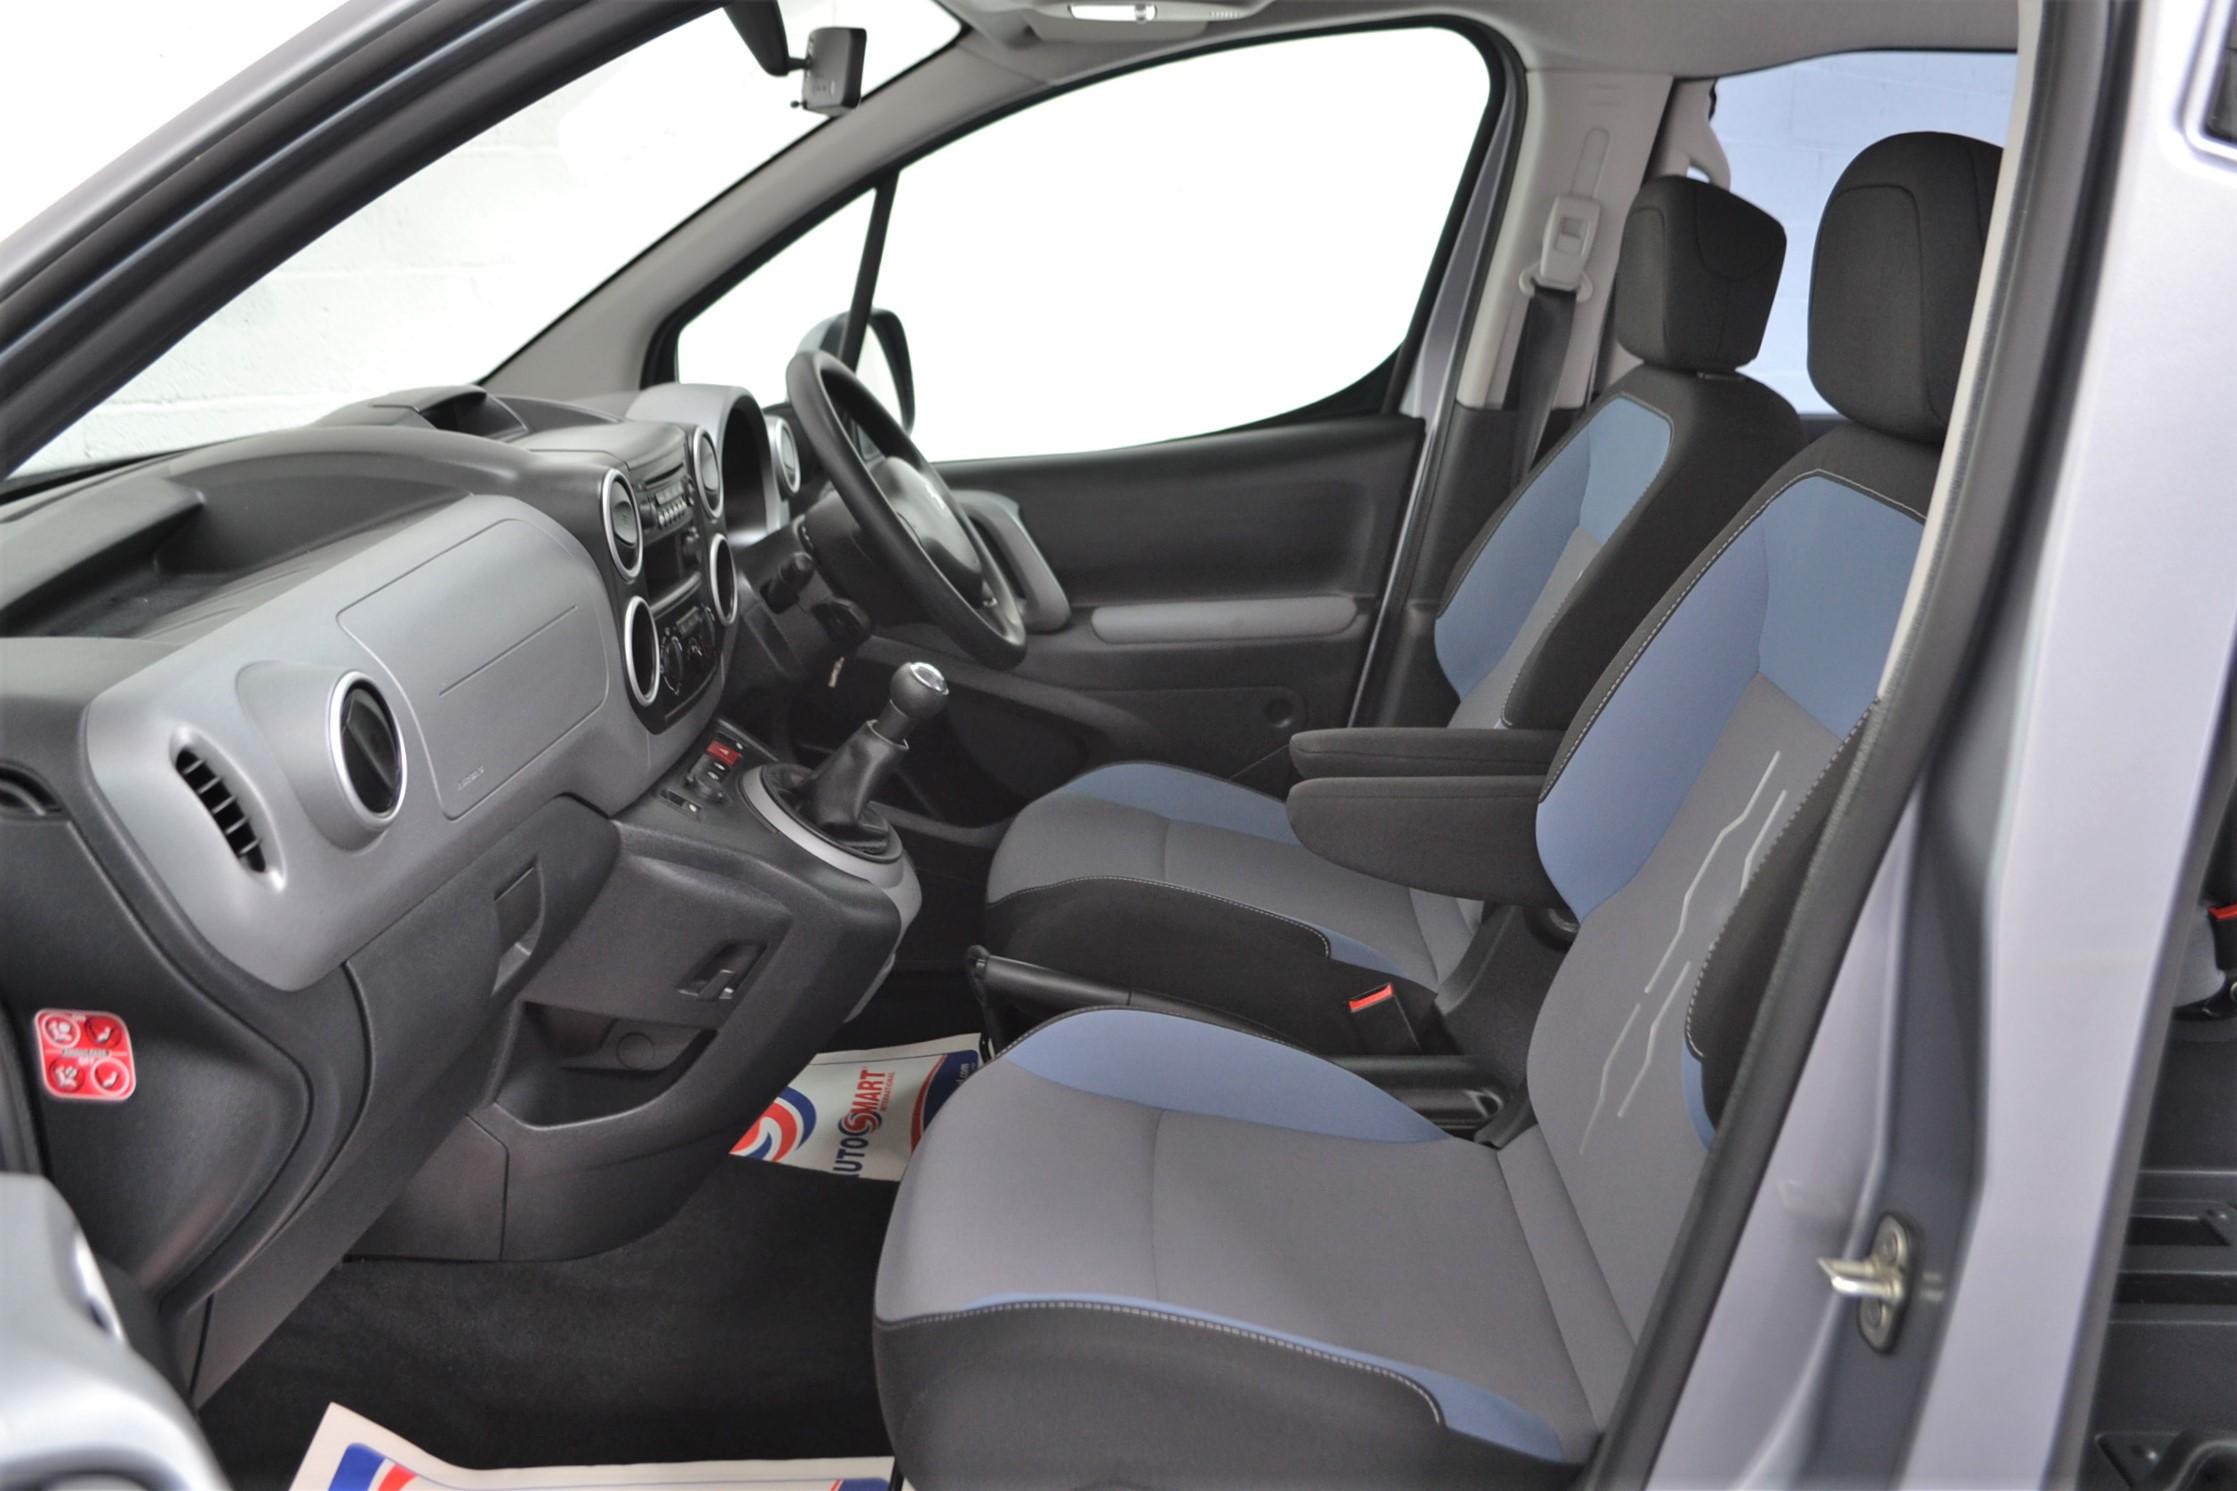 Used Wav Cars for Sale UK Citroen Berlingo WAV Car Peugeot Partner Petrol Wheelchair Accessible Vehicles Buy Sell Bristol Somerset Devon Dorset 10